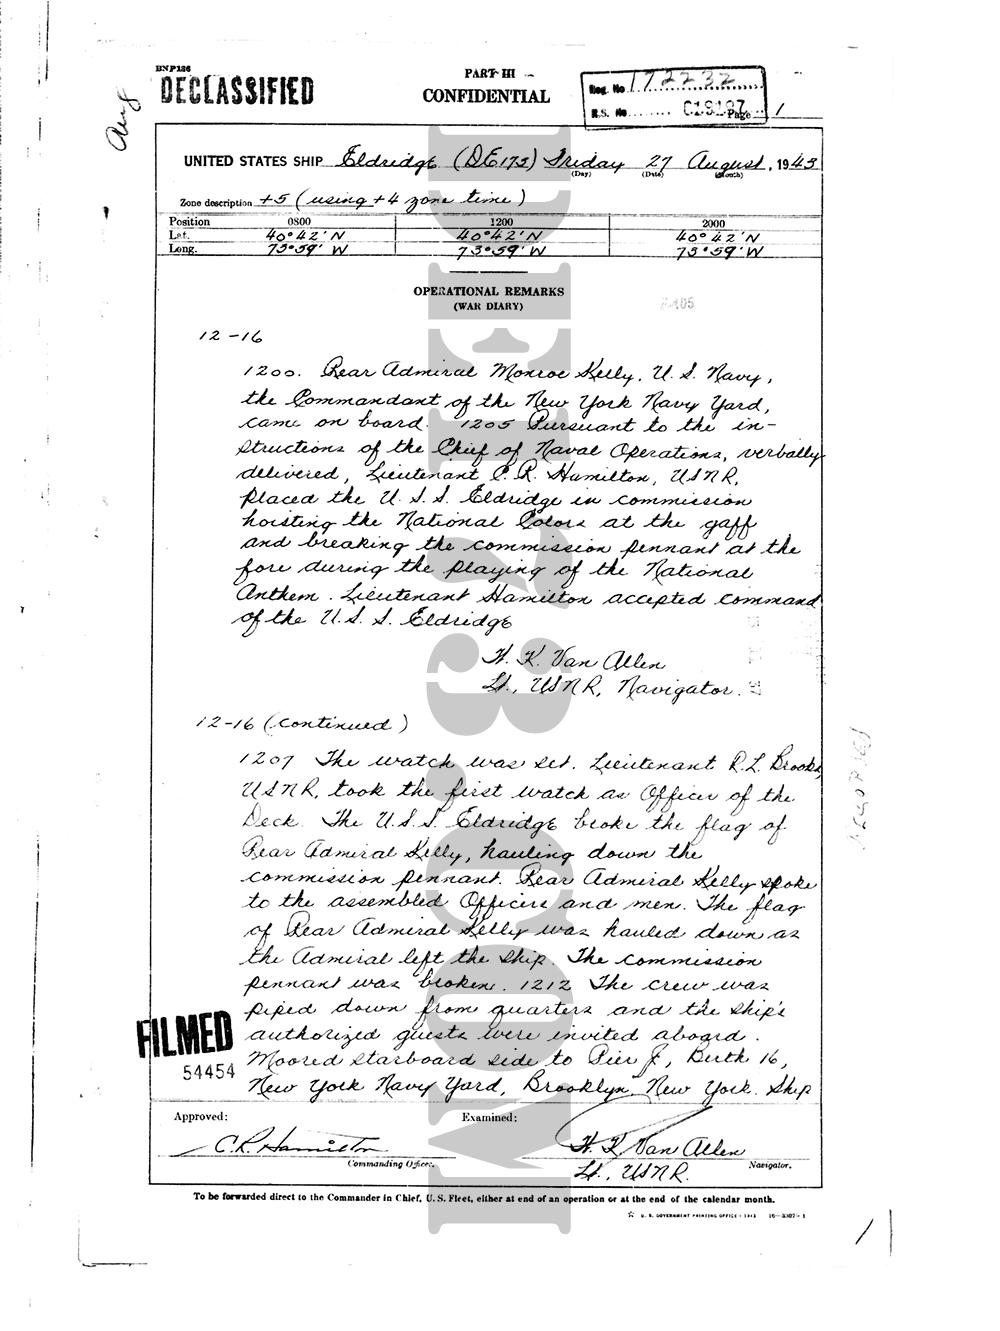 USS Eldridge Microfilm Page 001 / August 27th, 1943